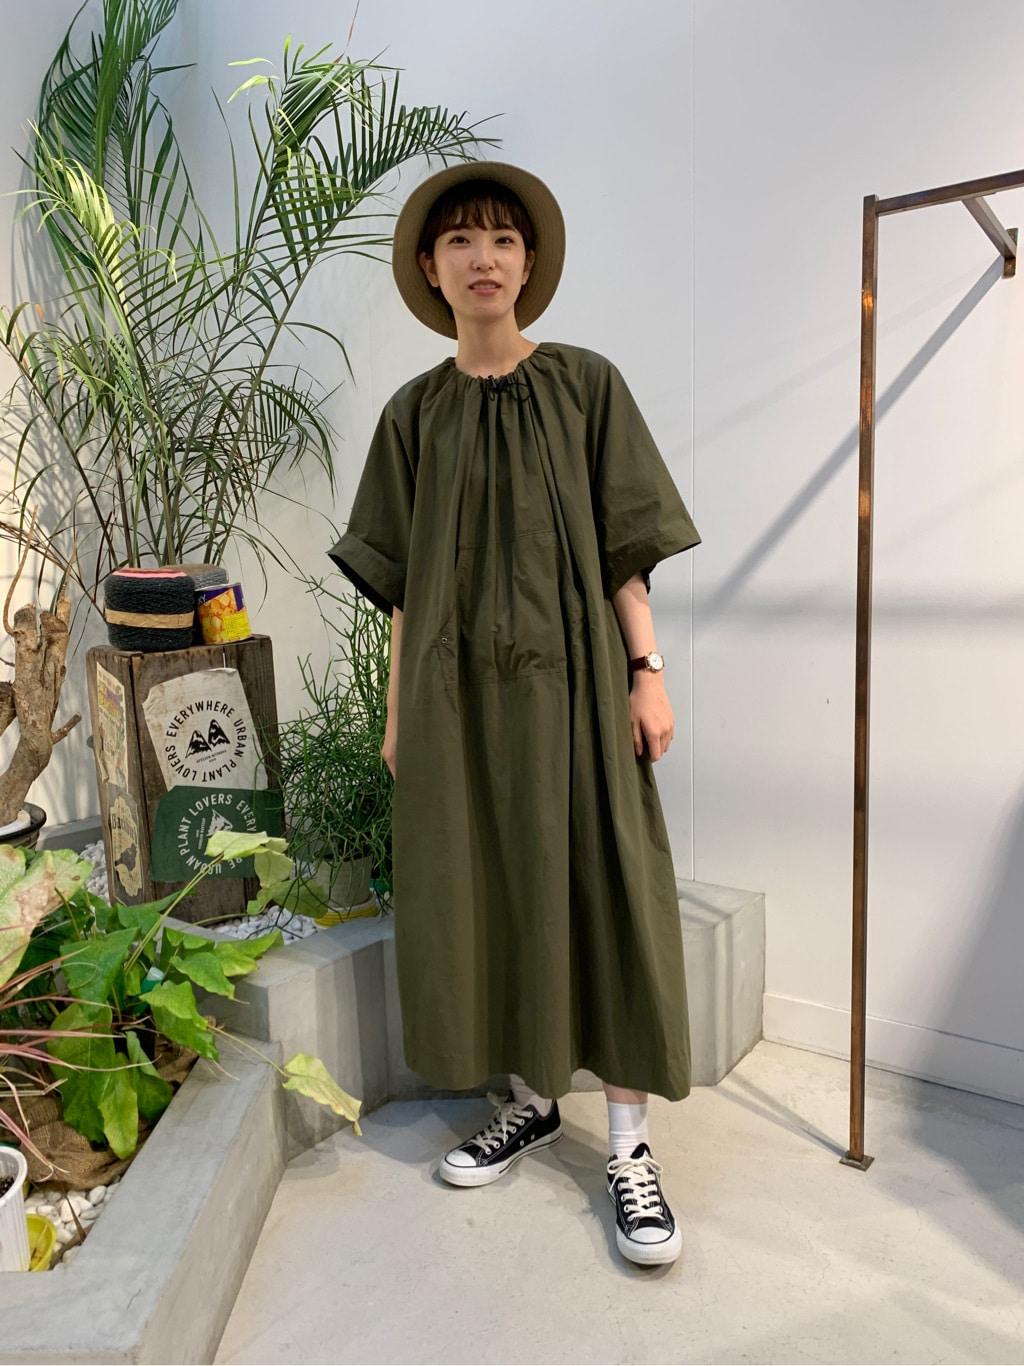 l'atelier du savon 名古屋栄路面 身長:161cm 2020.07.21